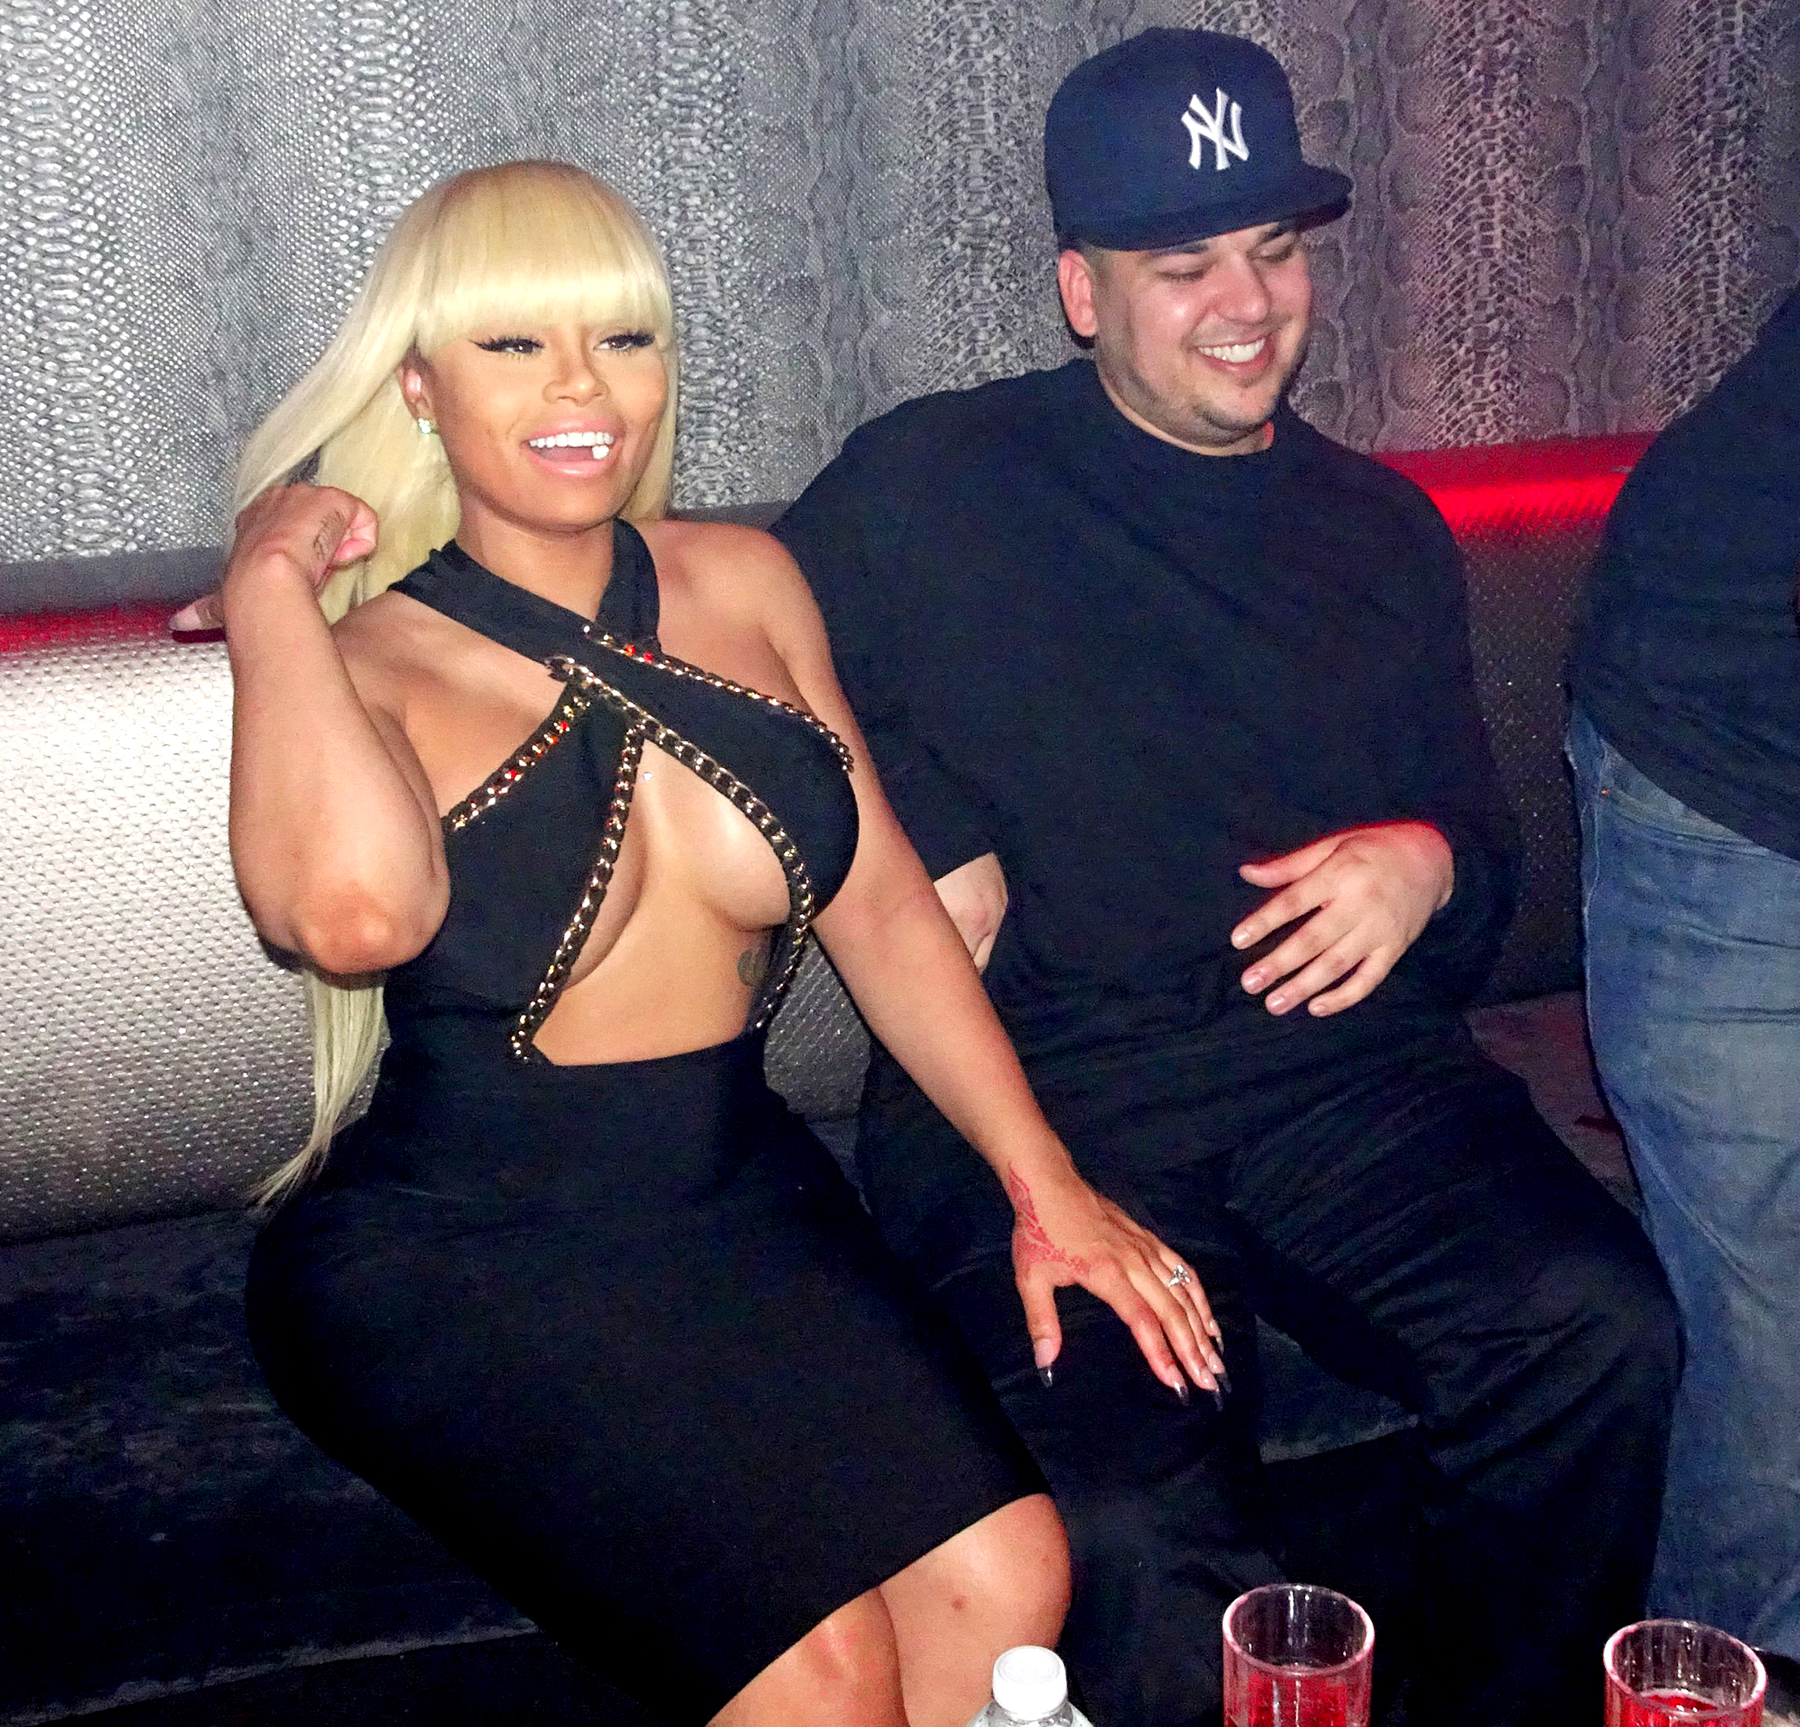 Rob Kardashian and Blac Chyna at Aces strip club in NYC.